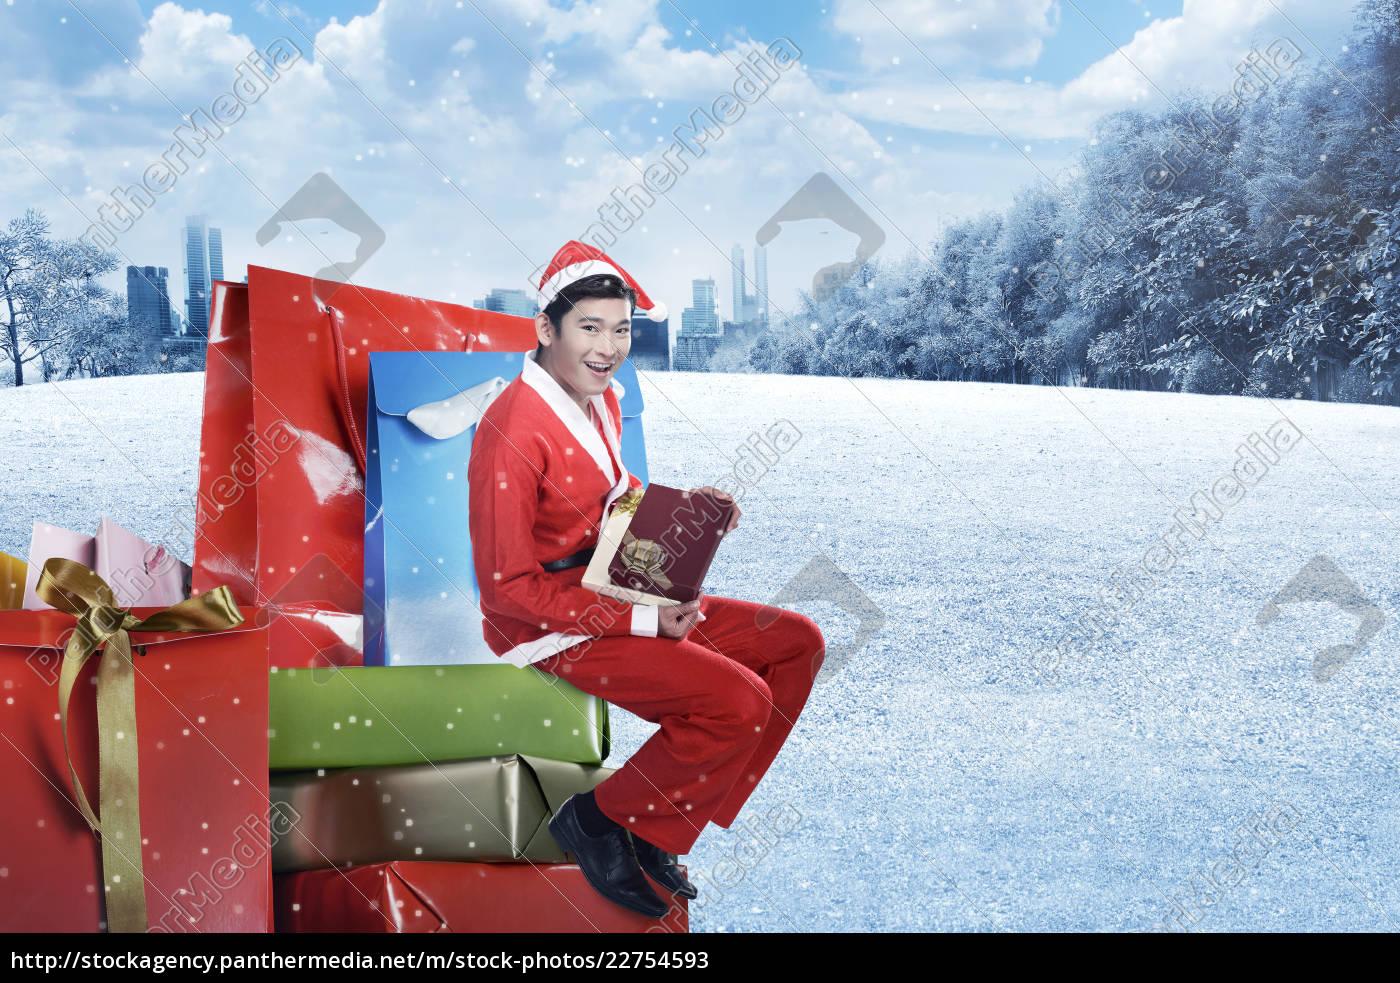 young, asian, man, in, santa, costume - 22754593